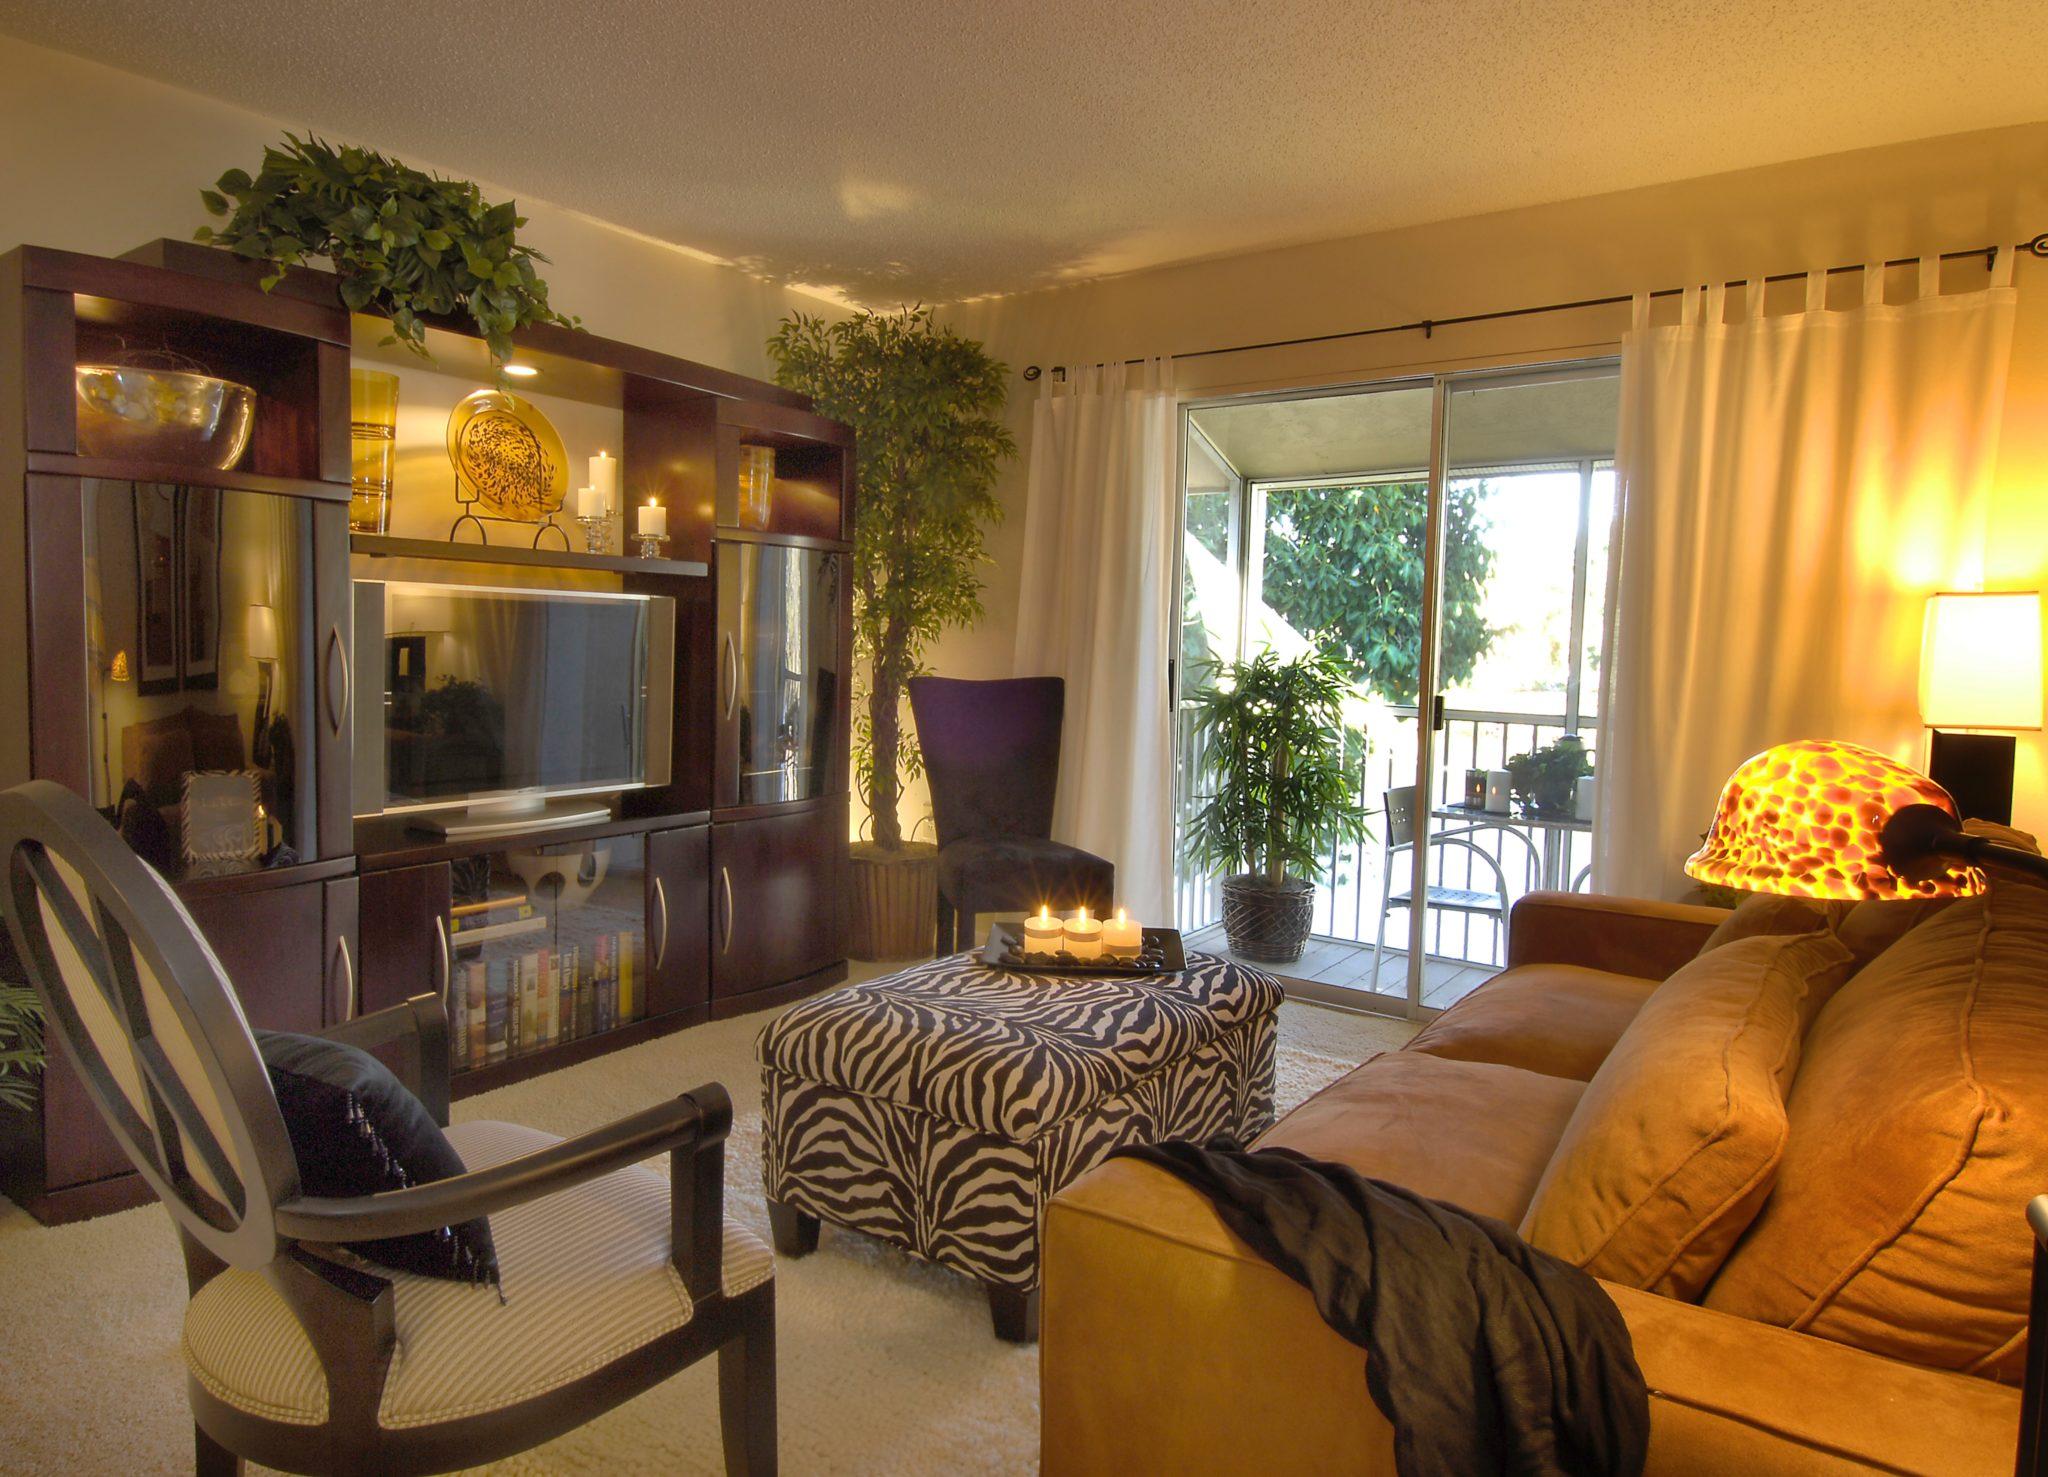 Small space condo living room, zebra ottoman, tortoise shell lamp and TV wall unit by Barbara Krai Interior Design